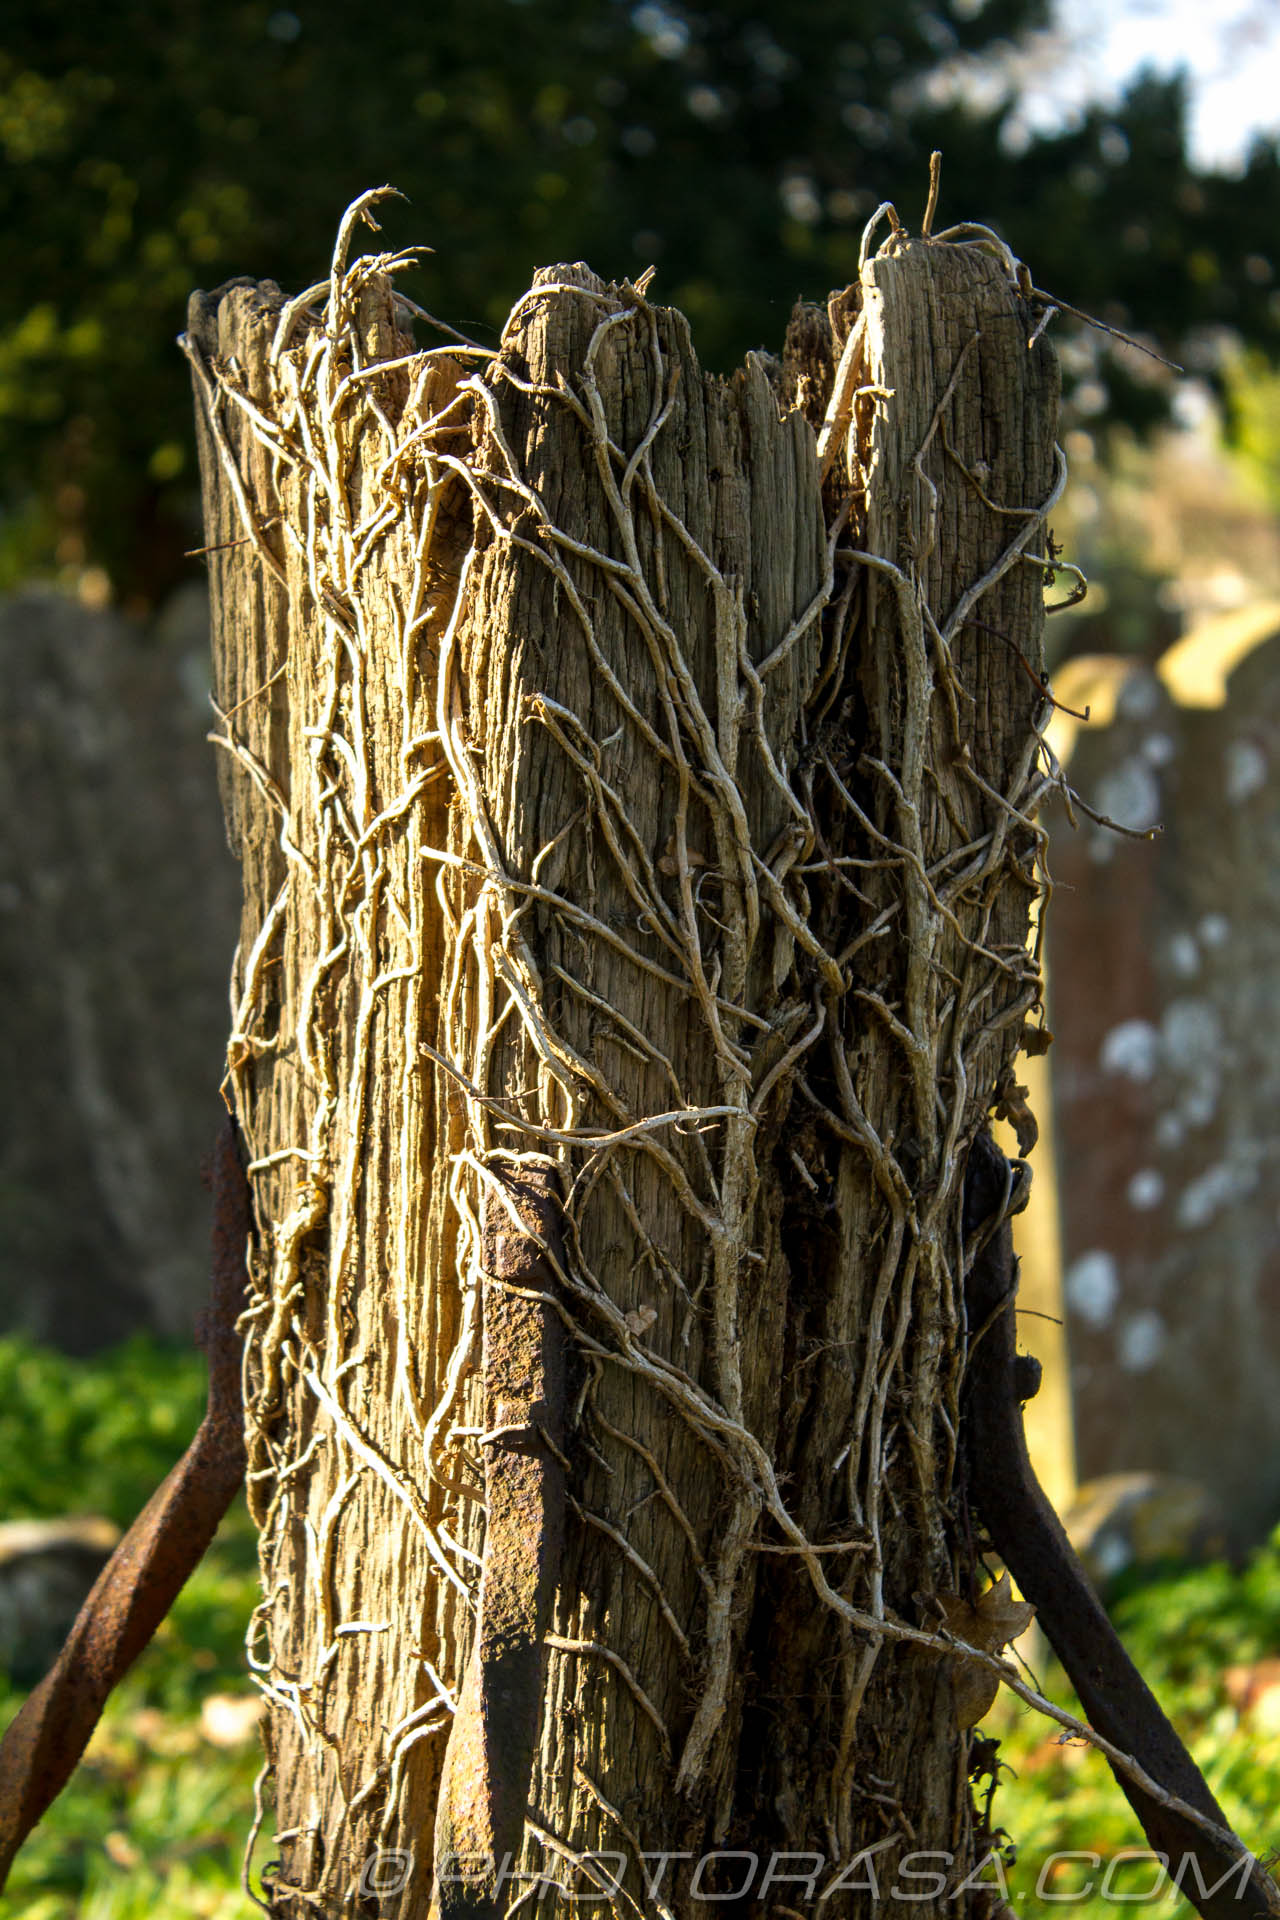 http://photorasa.com/parish-church-st-peter-st-paul-headcorn/broken-post-riddled-with-roots/